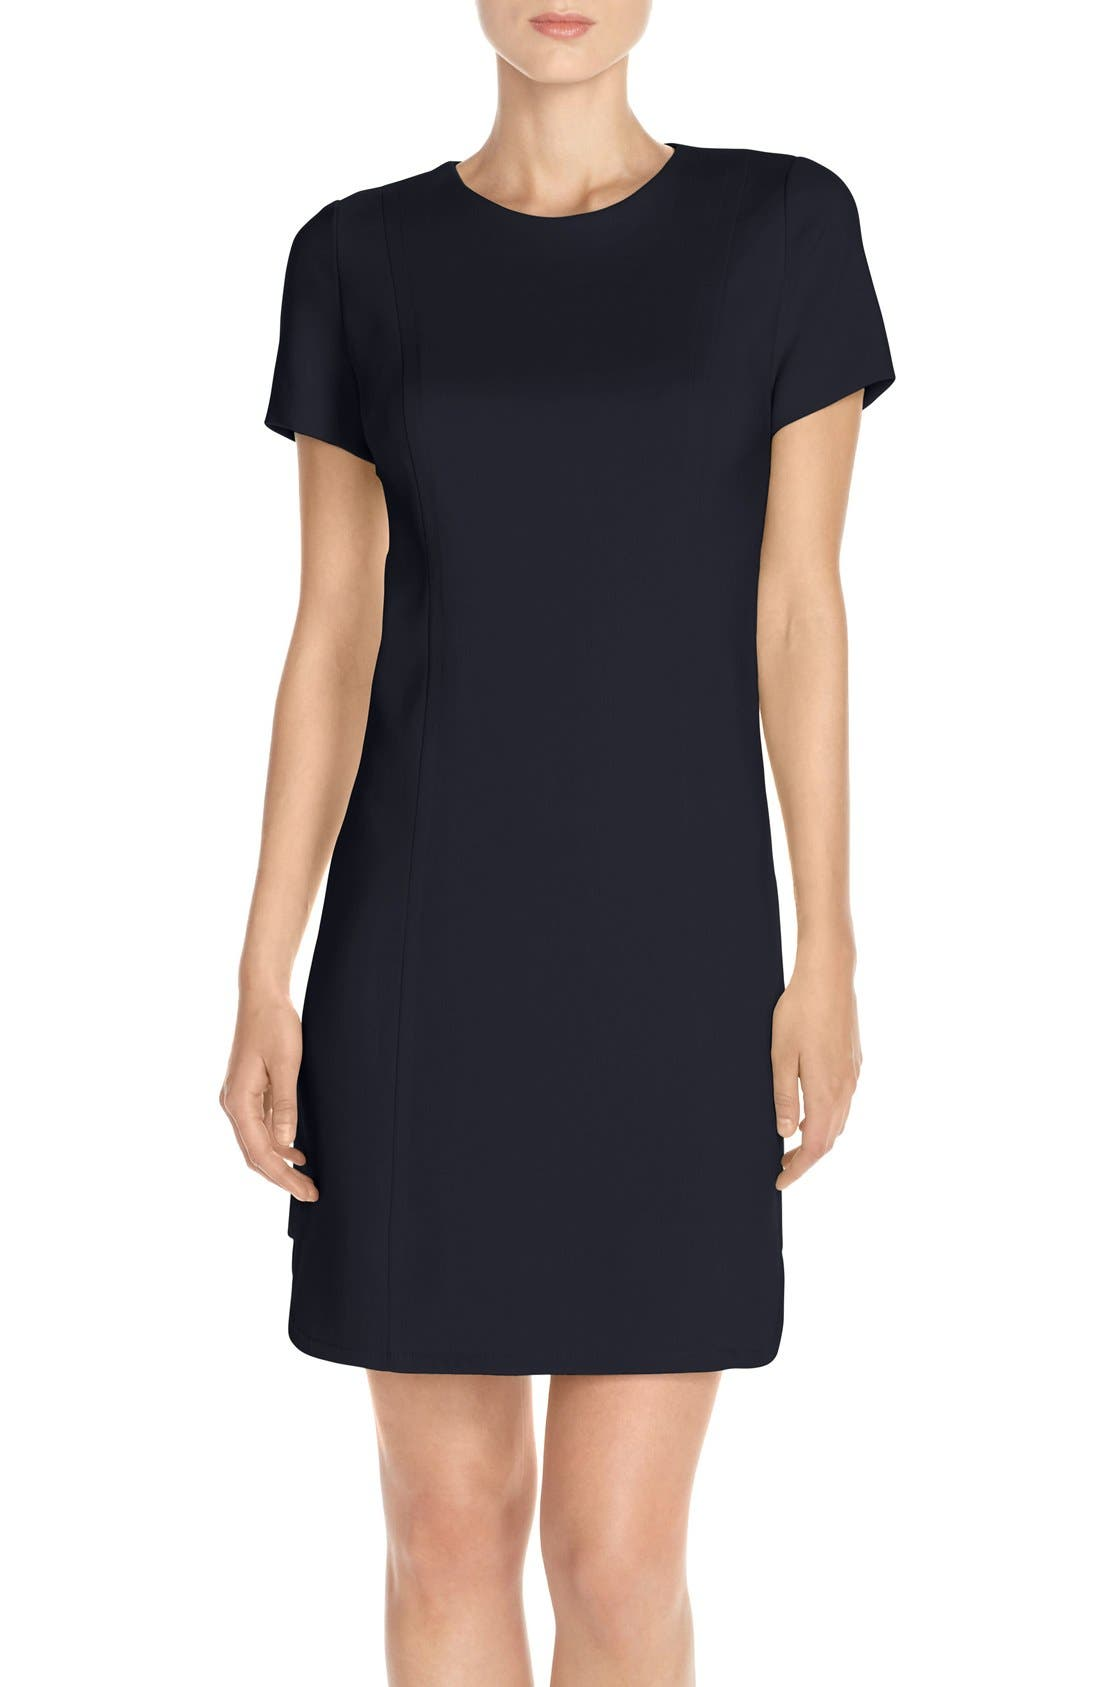 Alternate Image 1 Selected - Vince Camuto Seamed Shift Dress (Regular & Petite)